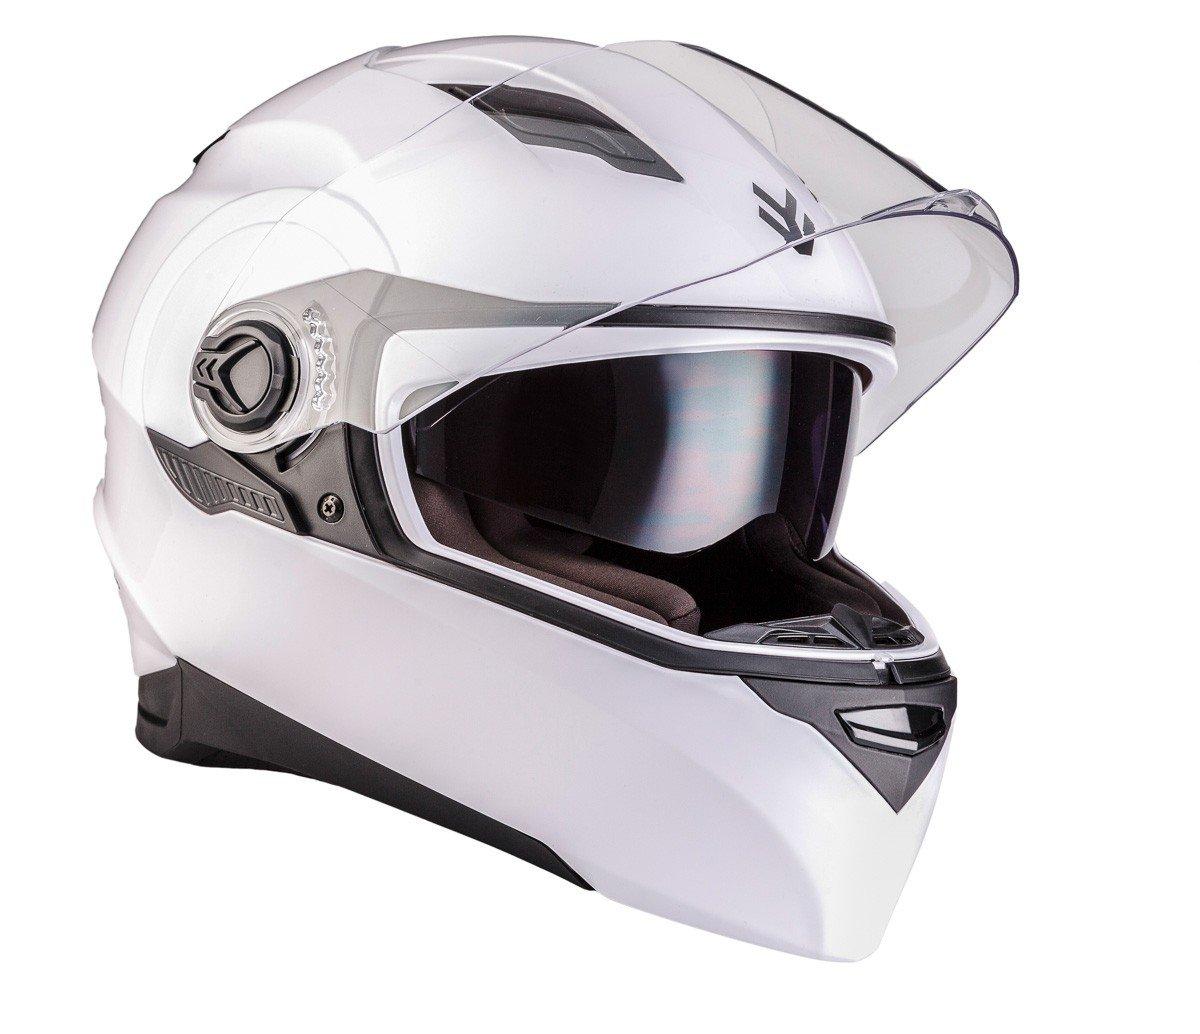 "Armor · AF-77 ""Carbon"" (gray) · Casco moto Integrale · Scooter Urban Cruiser FULL-FACE HELMET motocicleta · ECE certificado · Separate Visors · Click-n-Secure™ Clip · Bolsa de transporte &m"